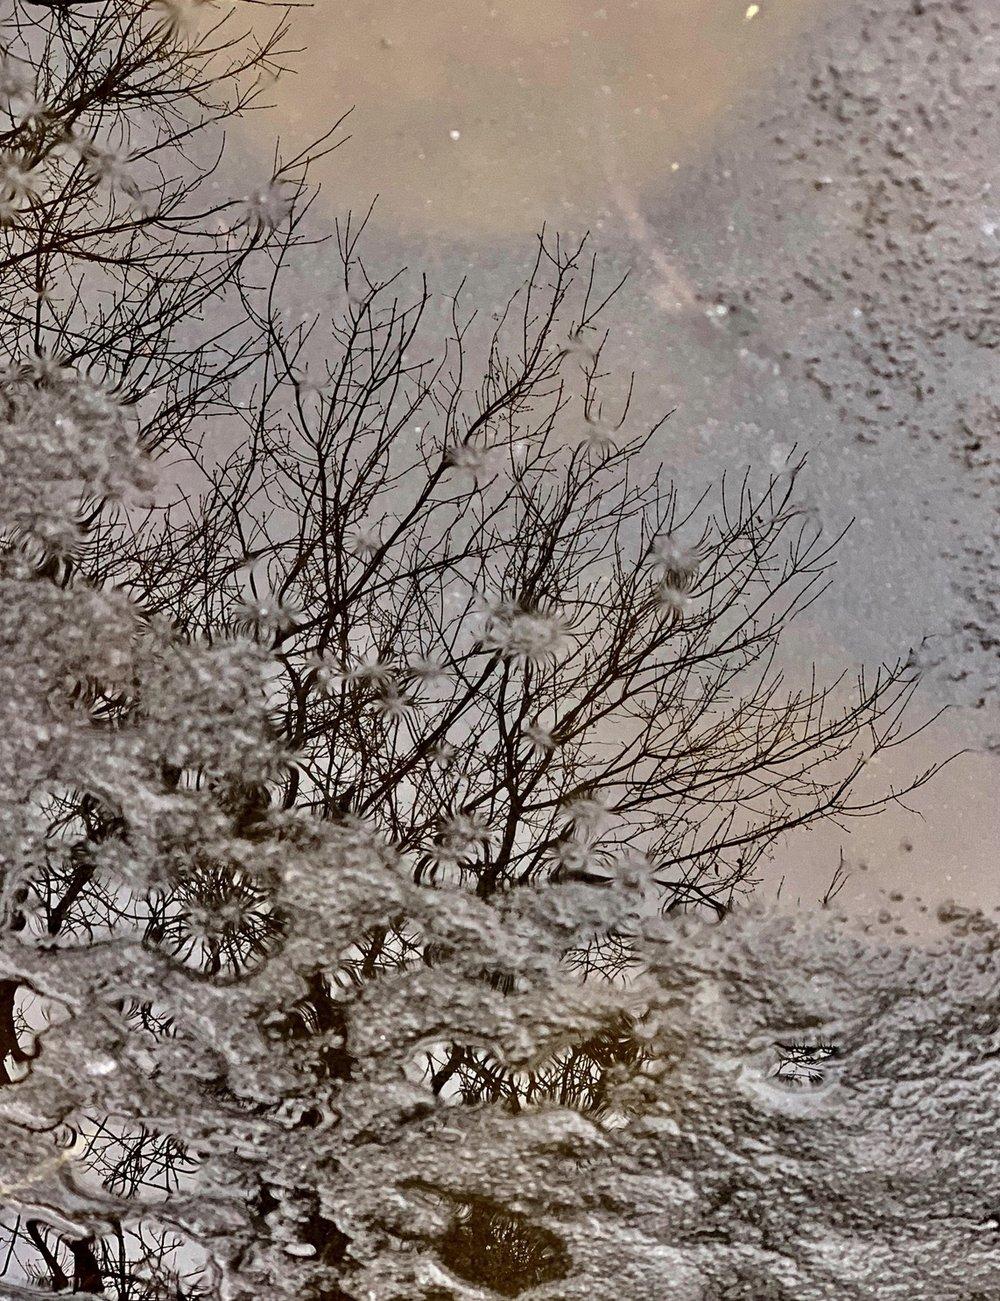 Screen Shot 2019-03-11 at 10.39.32 AM.jpg